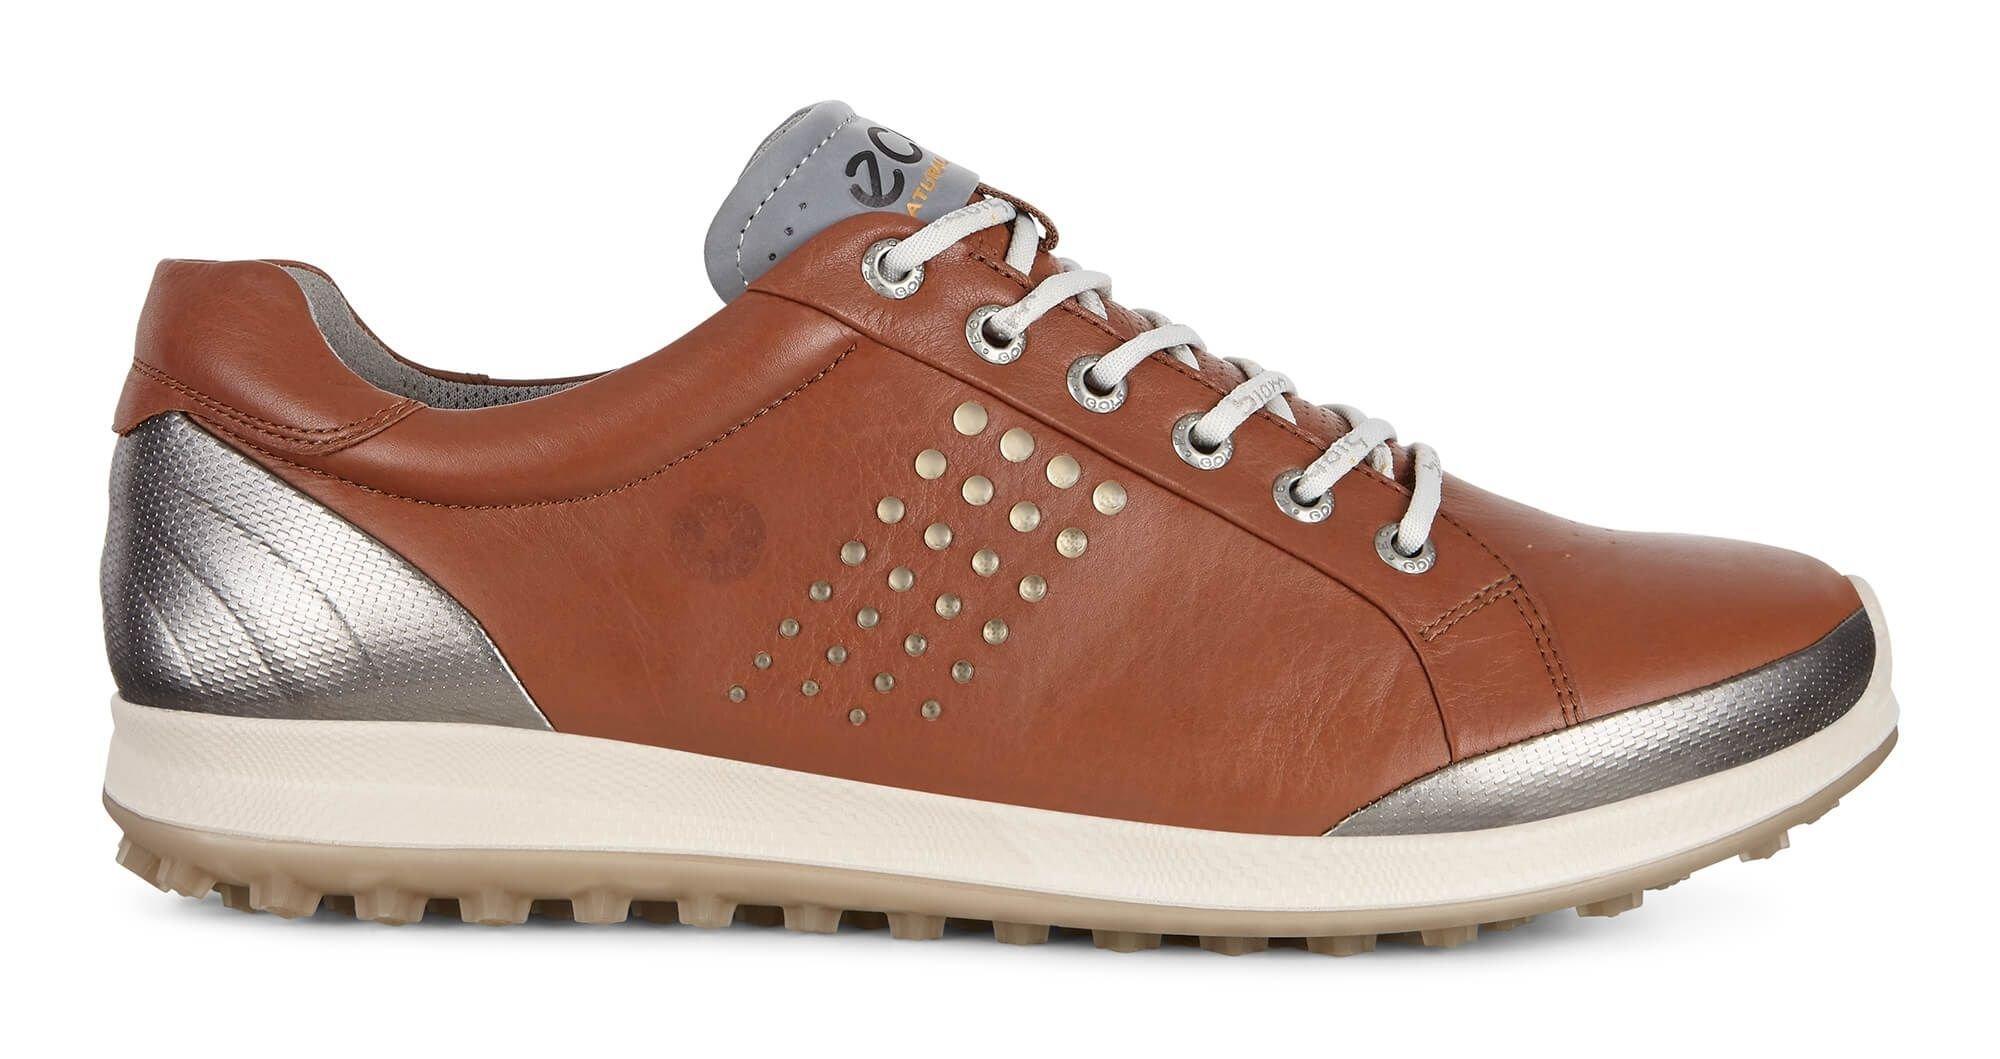 Ecco Biom Hybrid 2 Golf Shoes Mahogany Oyster On Sale Carl S Golfland